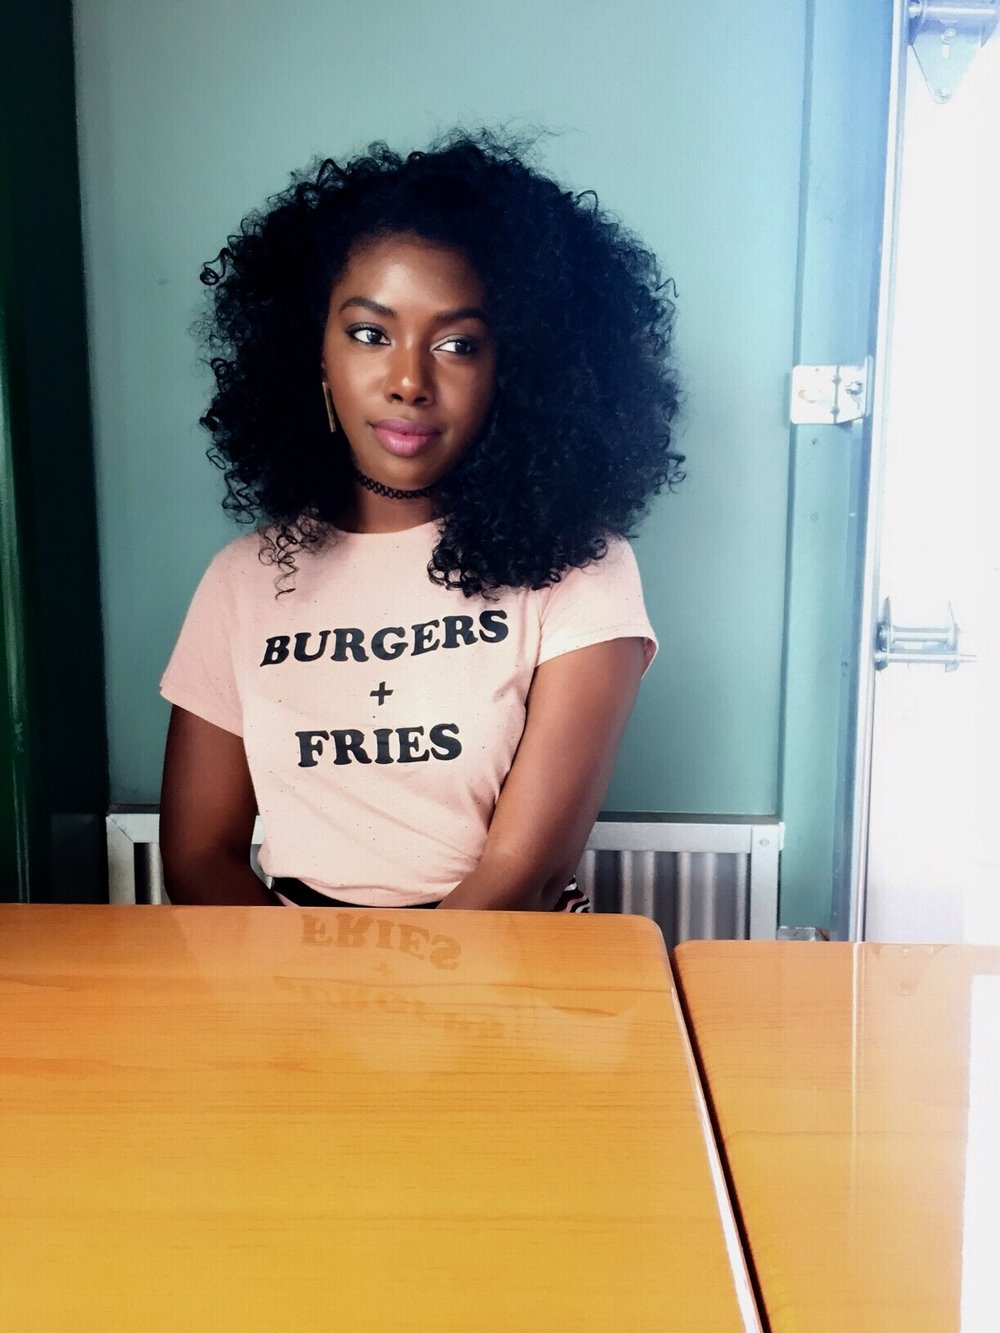 Tremendous Lunch Break Keinthecity Short Hairstyles For Black Women Fulllsitofus